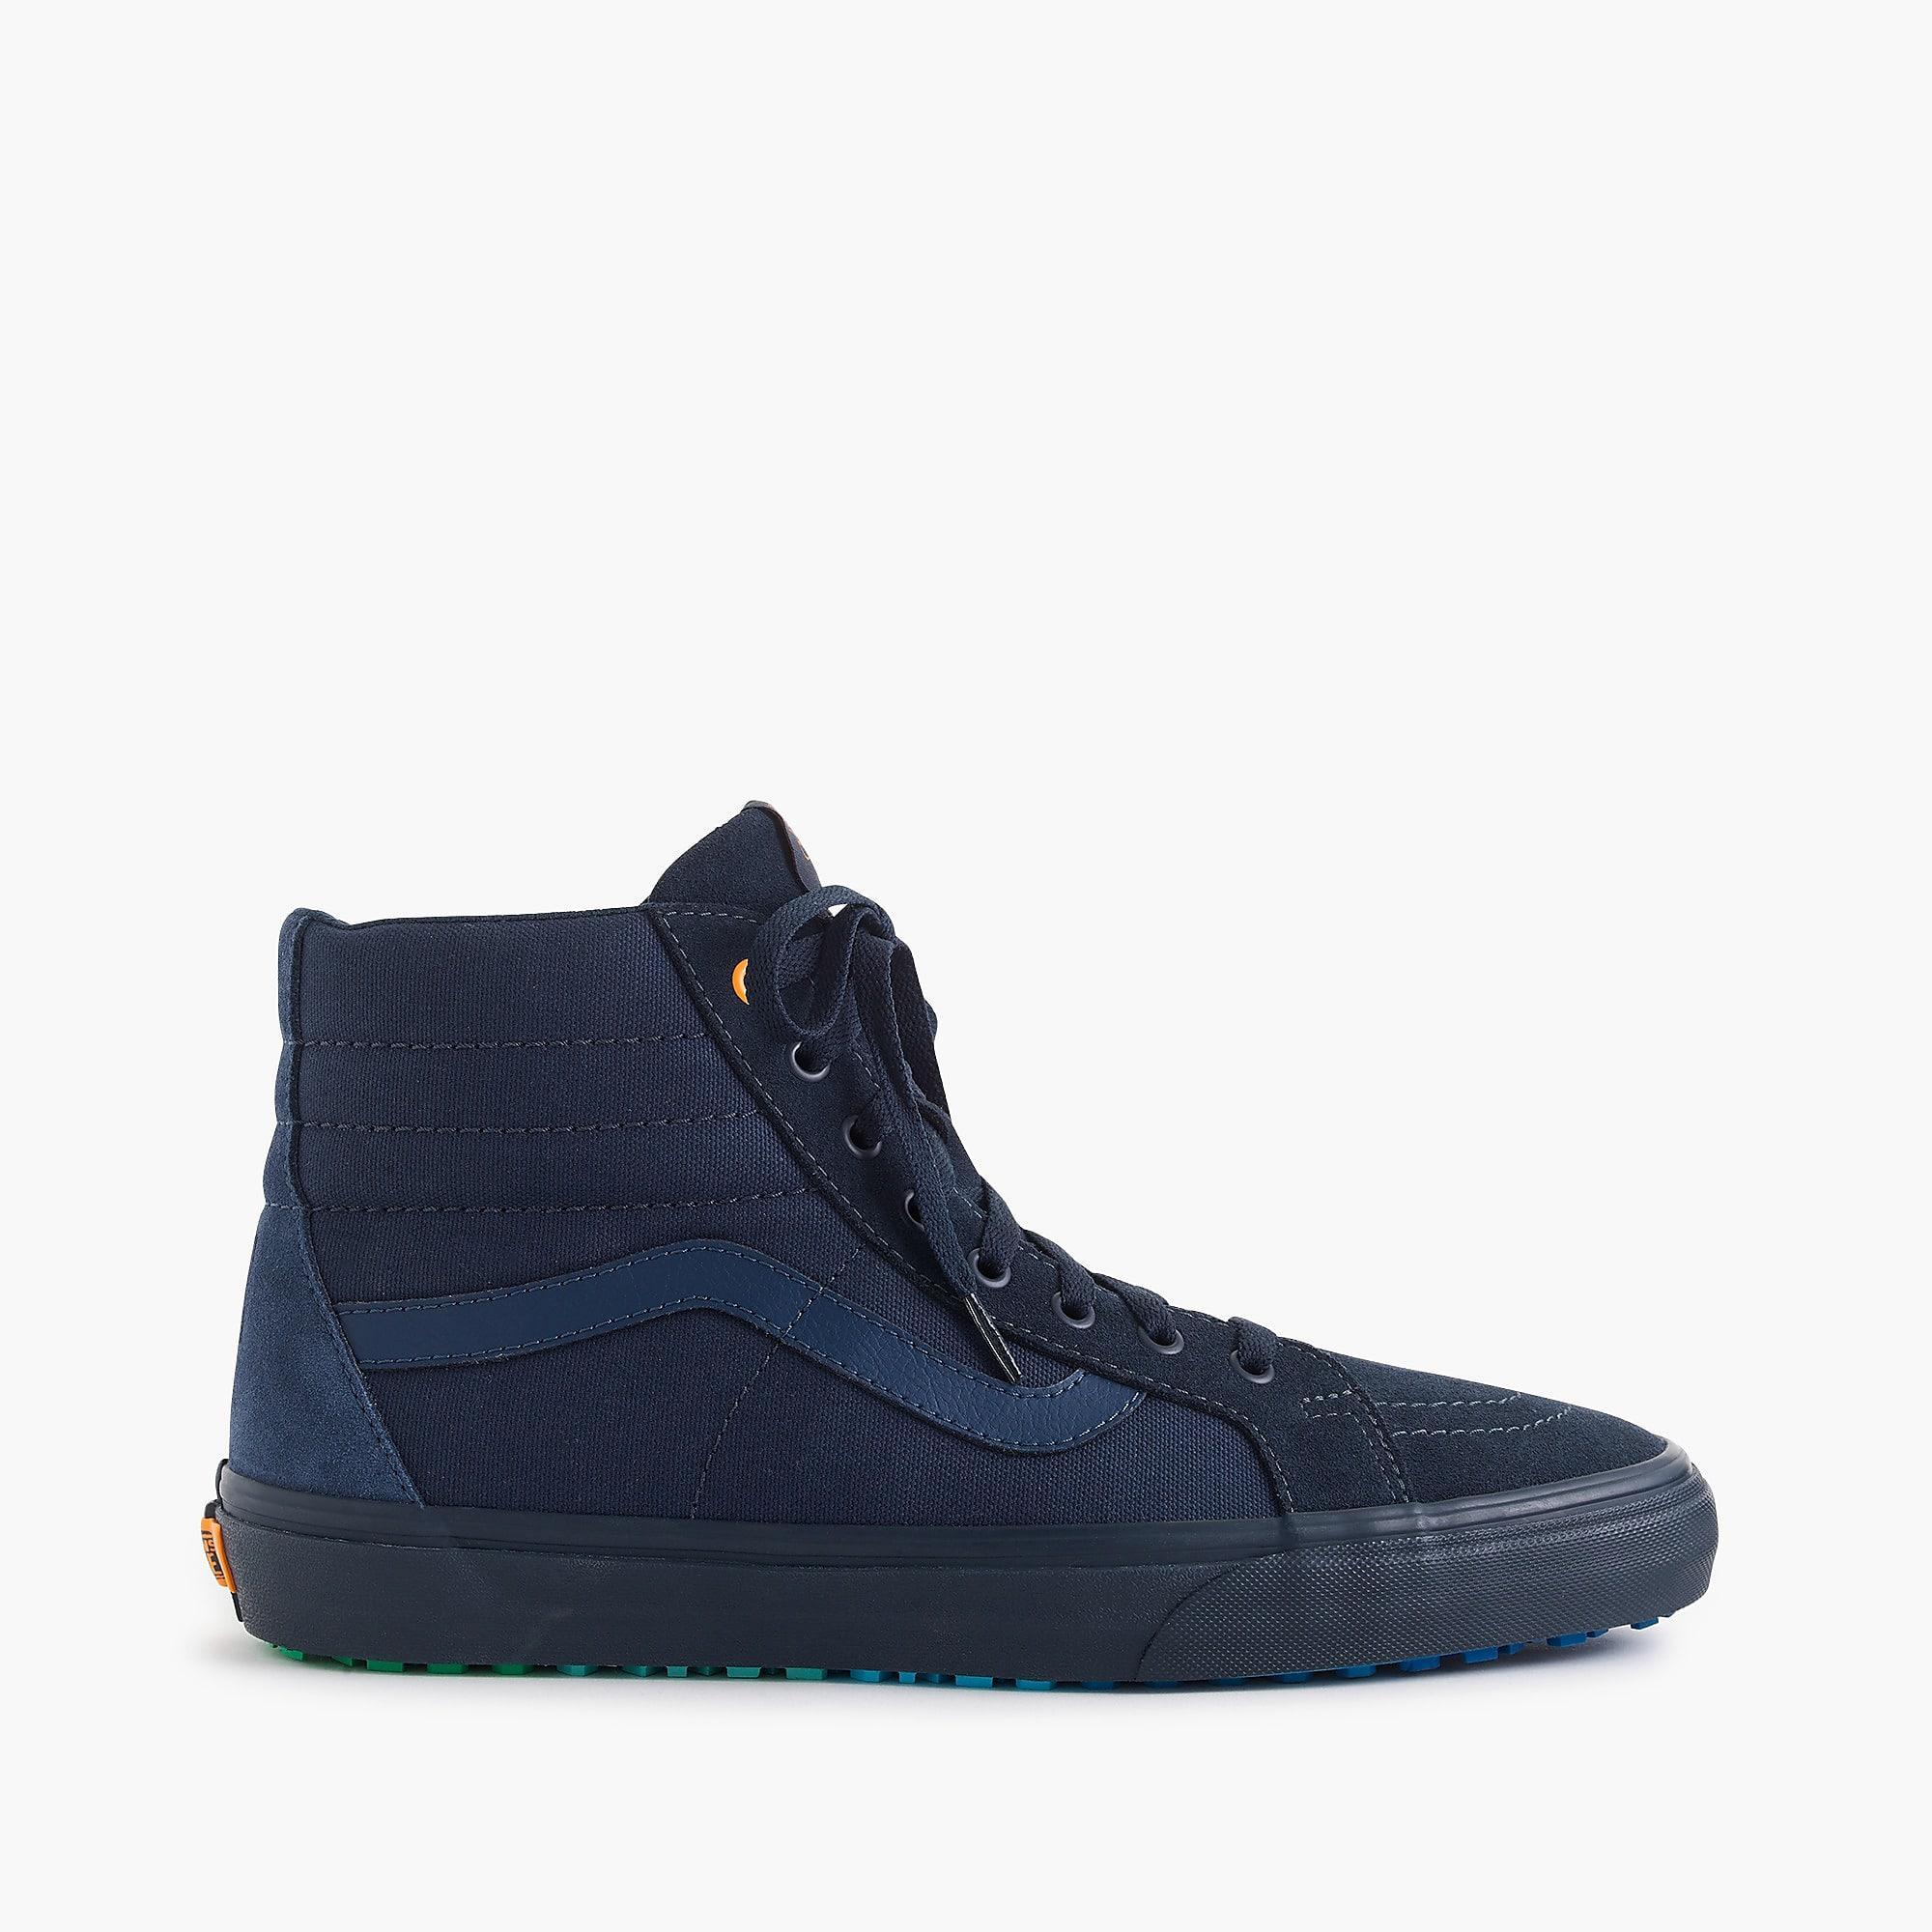 mehr Fotos neueste attraktive Designs X Hedley & Bennett Sk8 Hi Sneakers